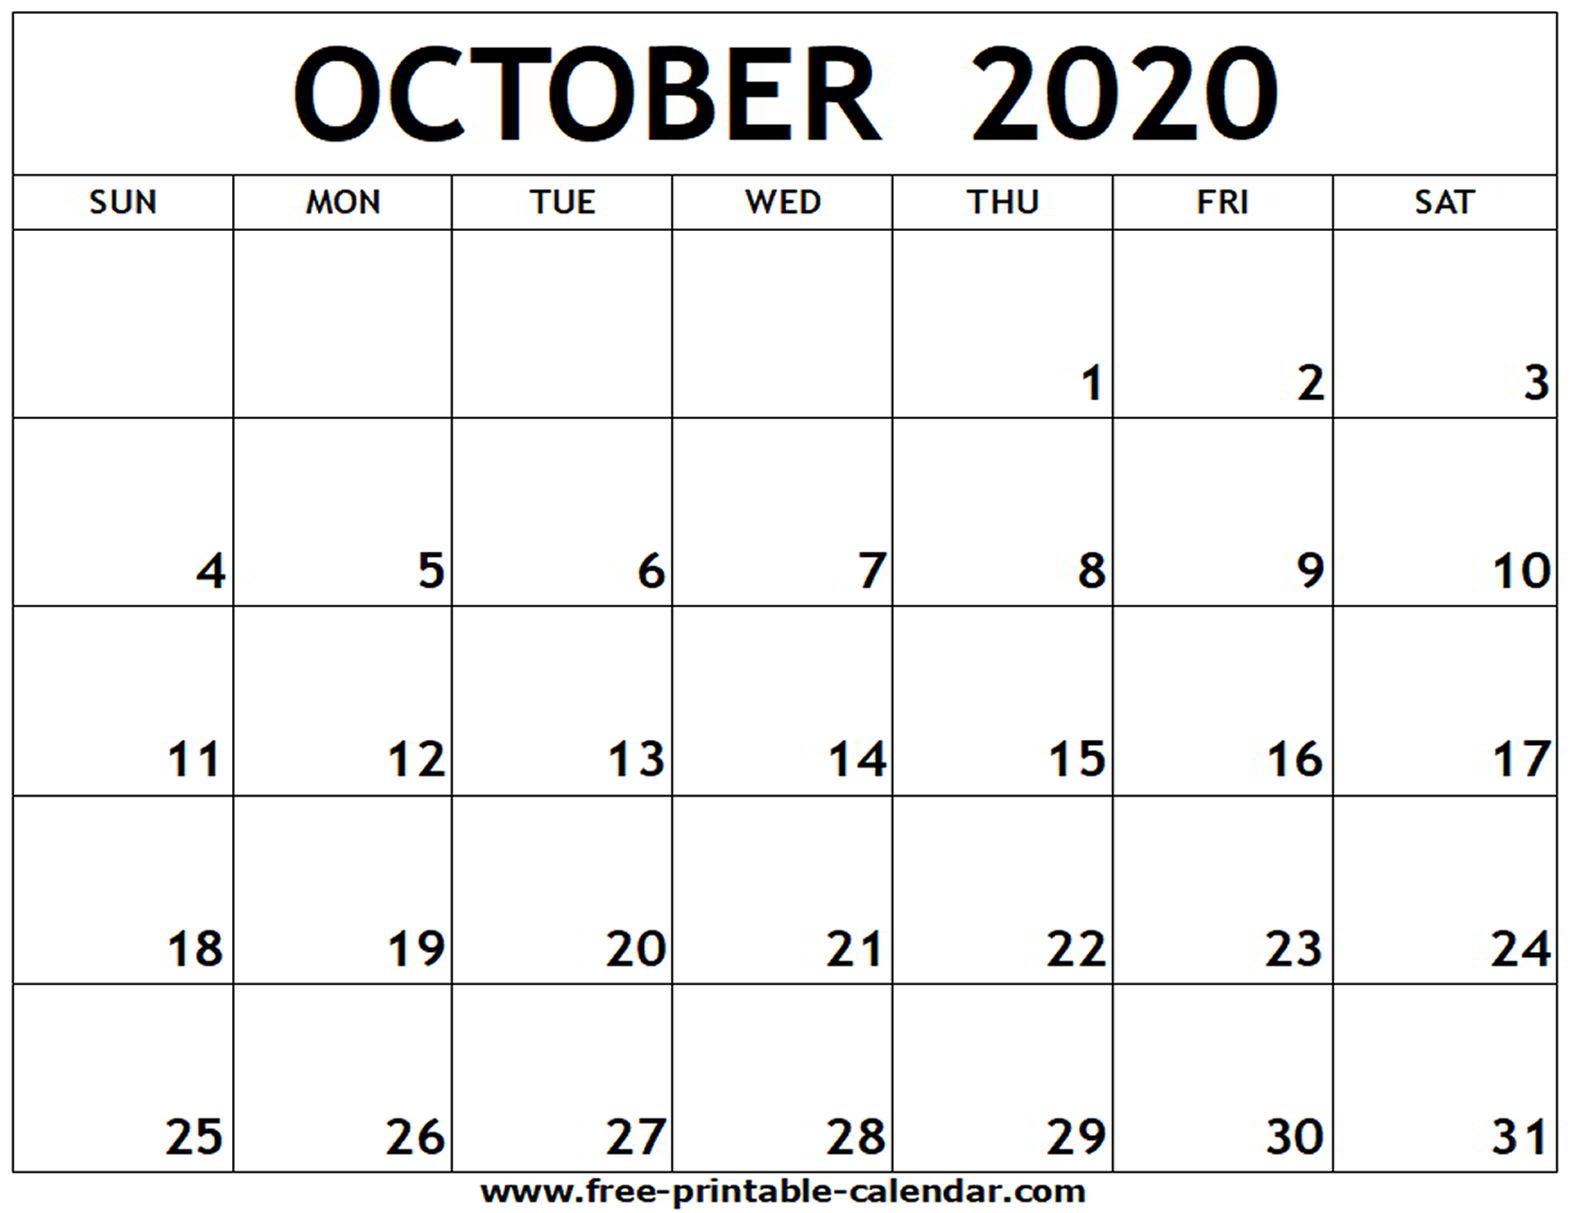 October 2020 Printable Calendar Pdf - Zohre.horizonconsulting.co